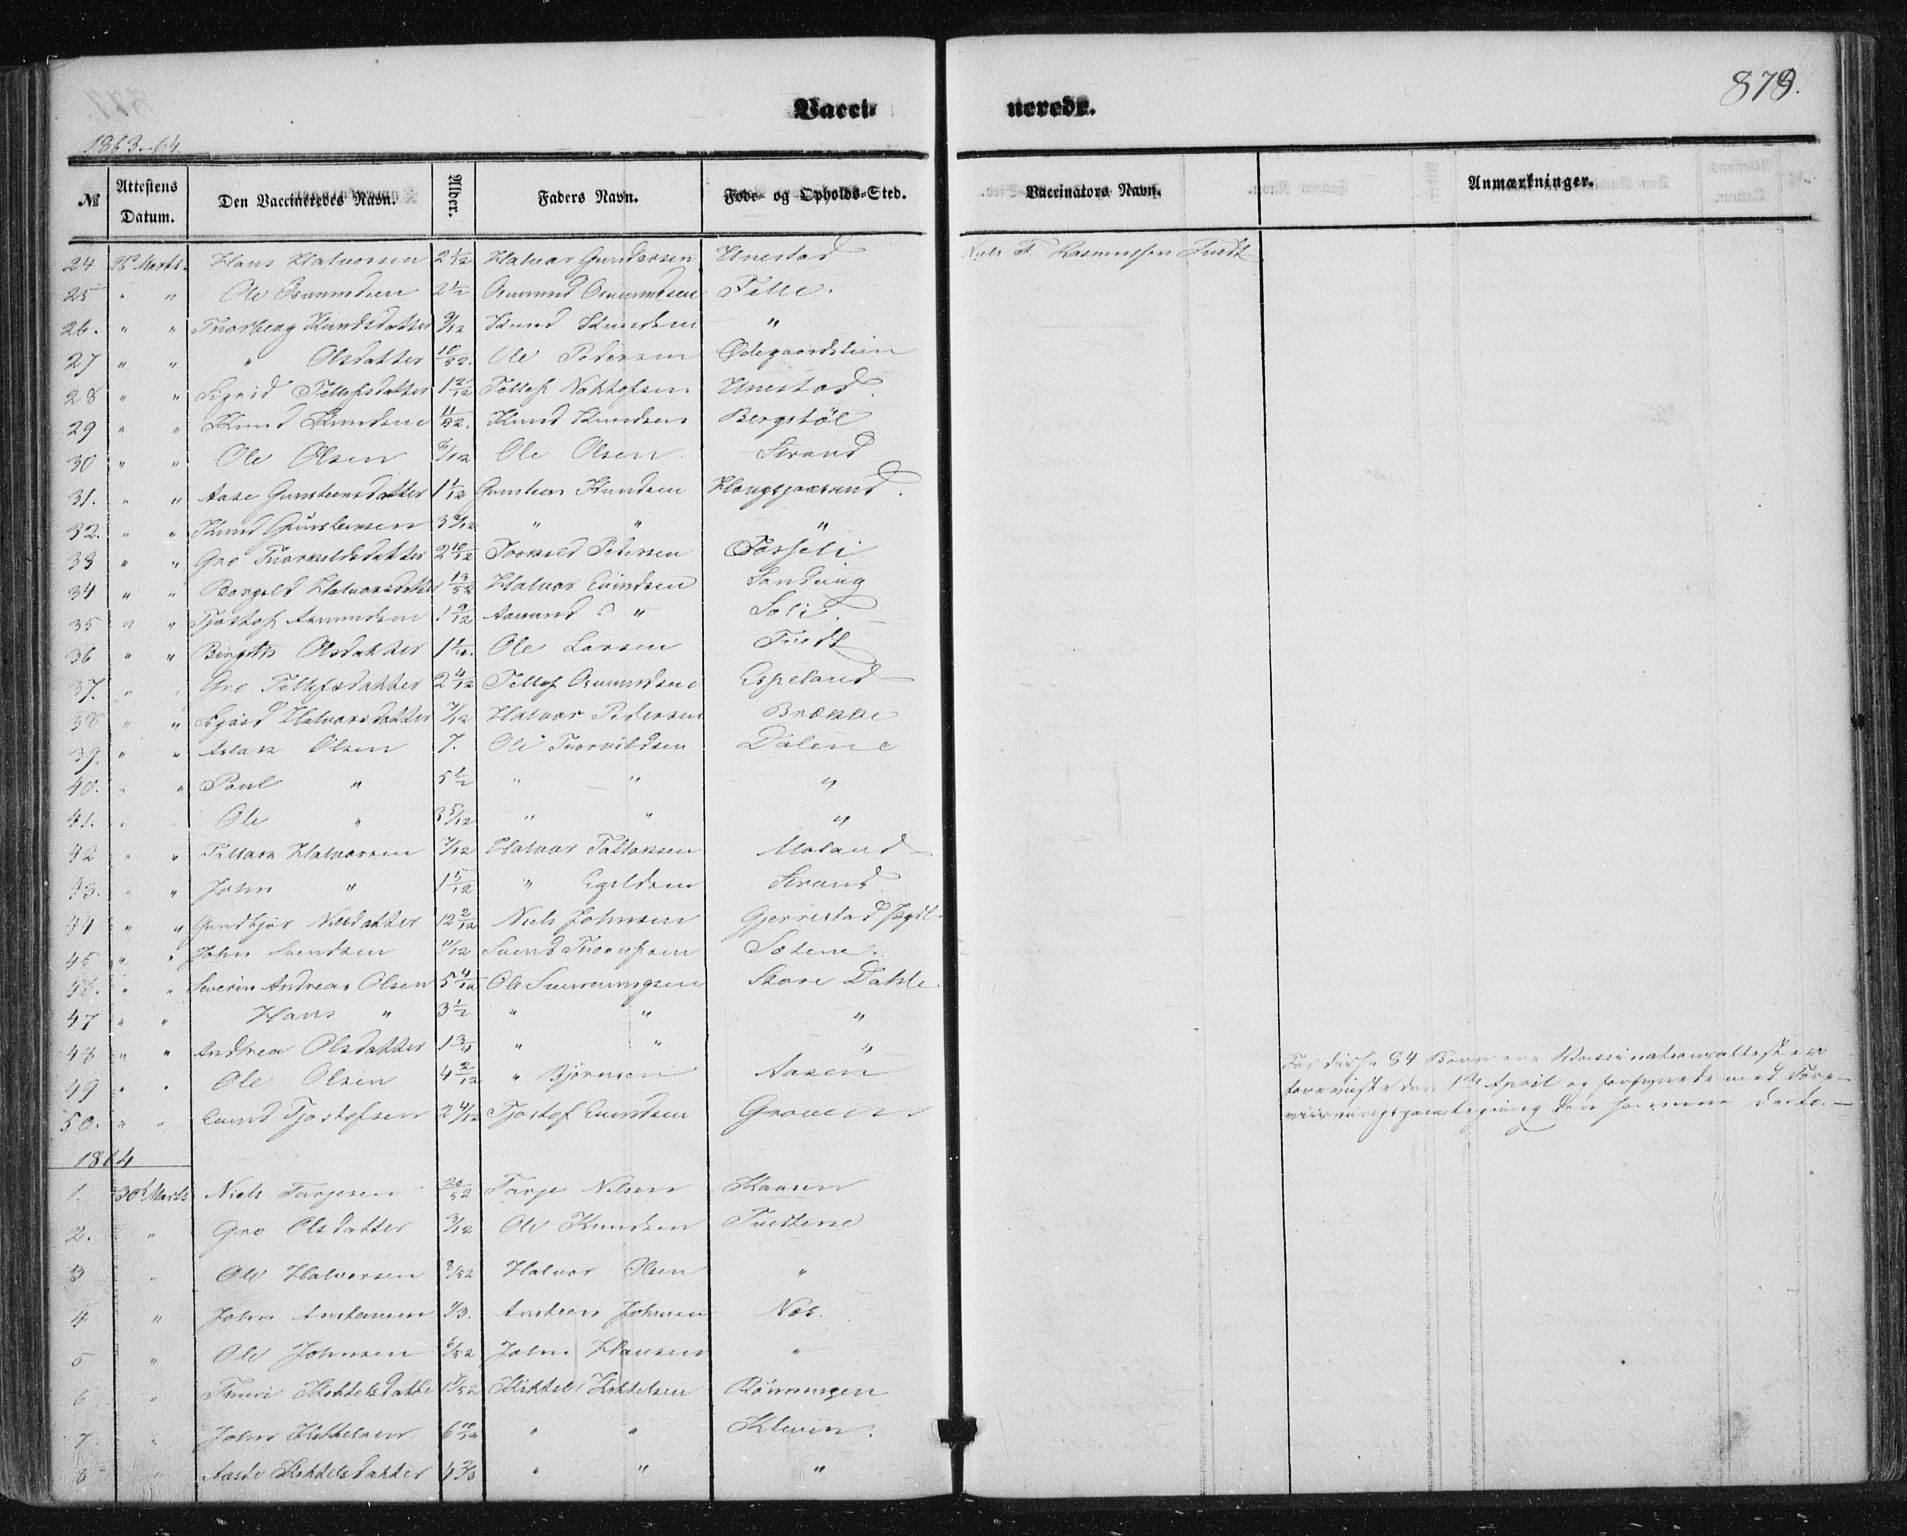 SAKO, Nissedal kirkebøker, F/Fa/L0003: Ministerialbok nr. I 3, 1846-1870, s. 878-879